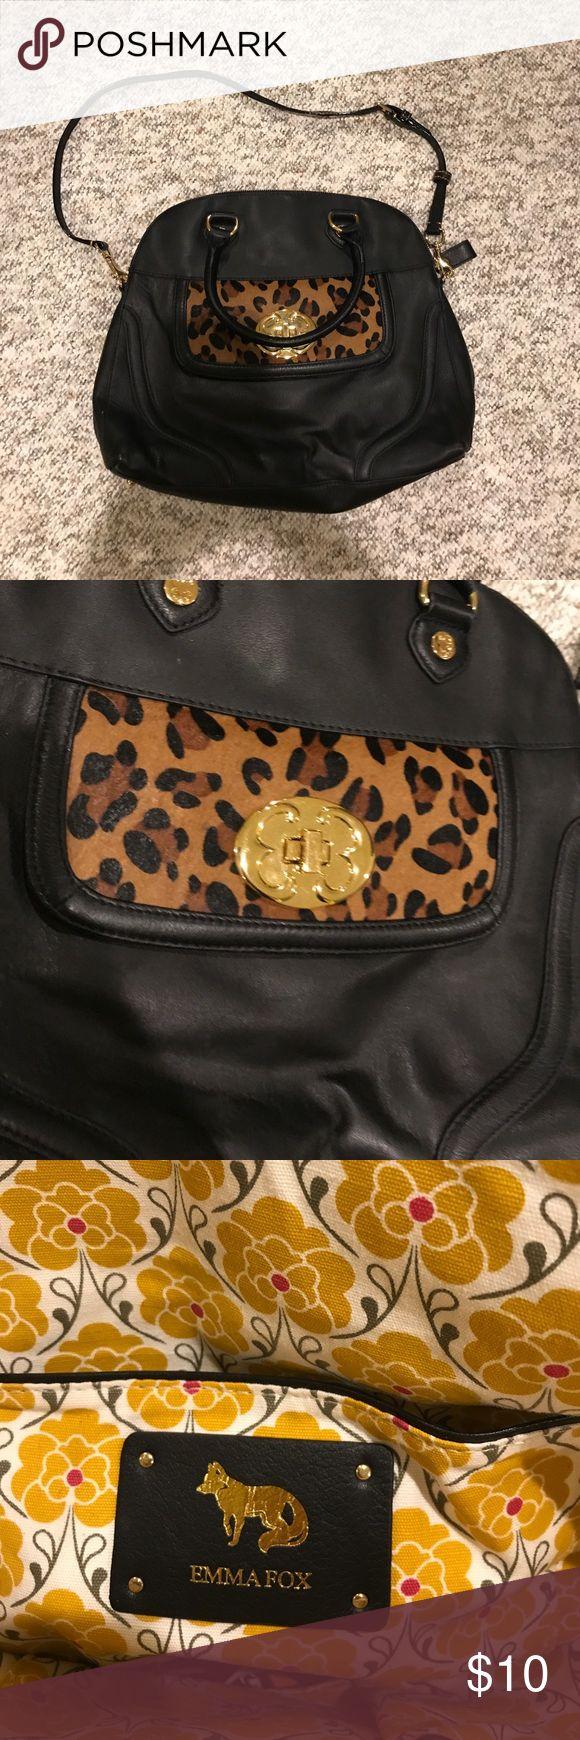 Emma Fox purse Brand new Emma Fox bag Emma Fox Bags Crossbody Bags